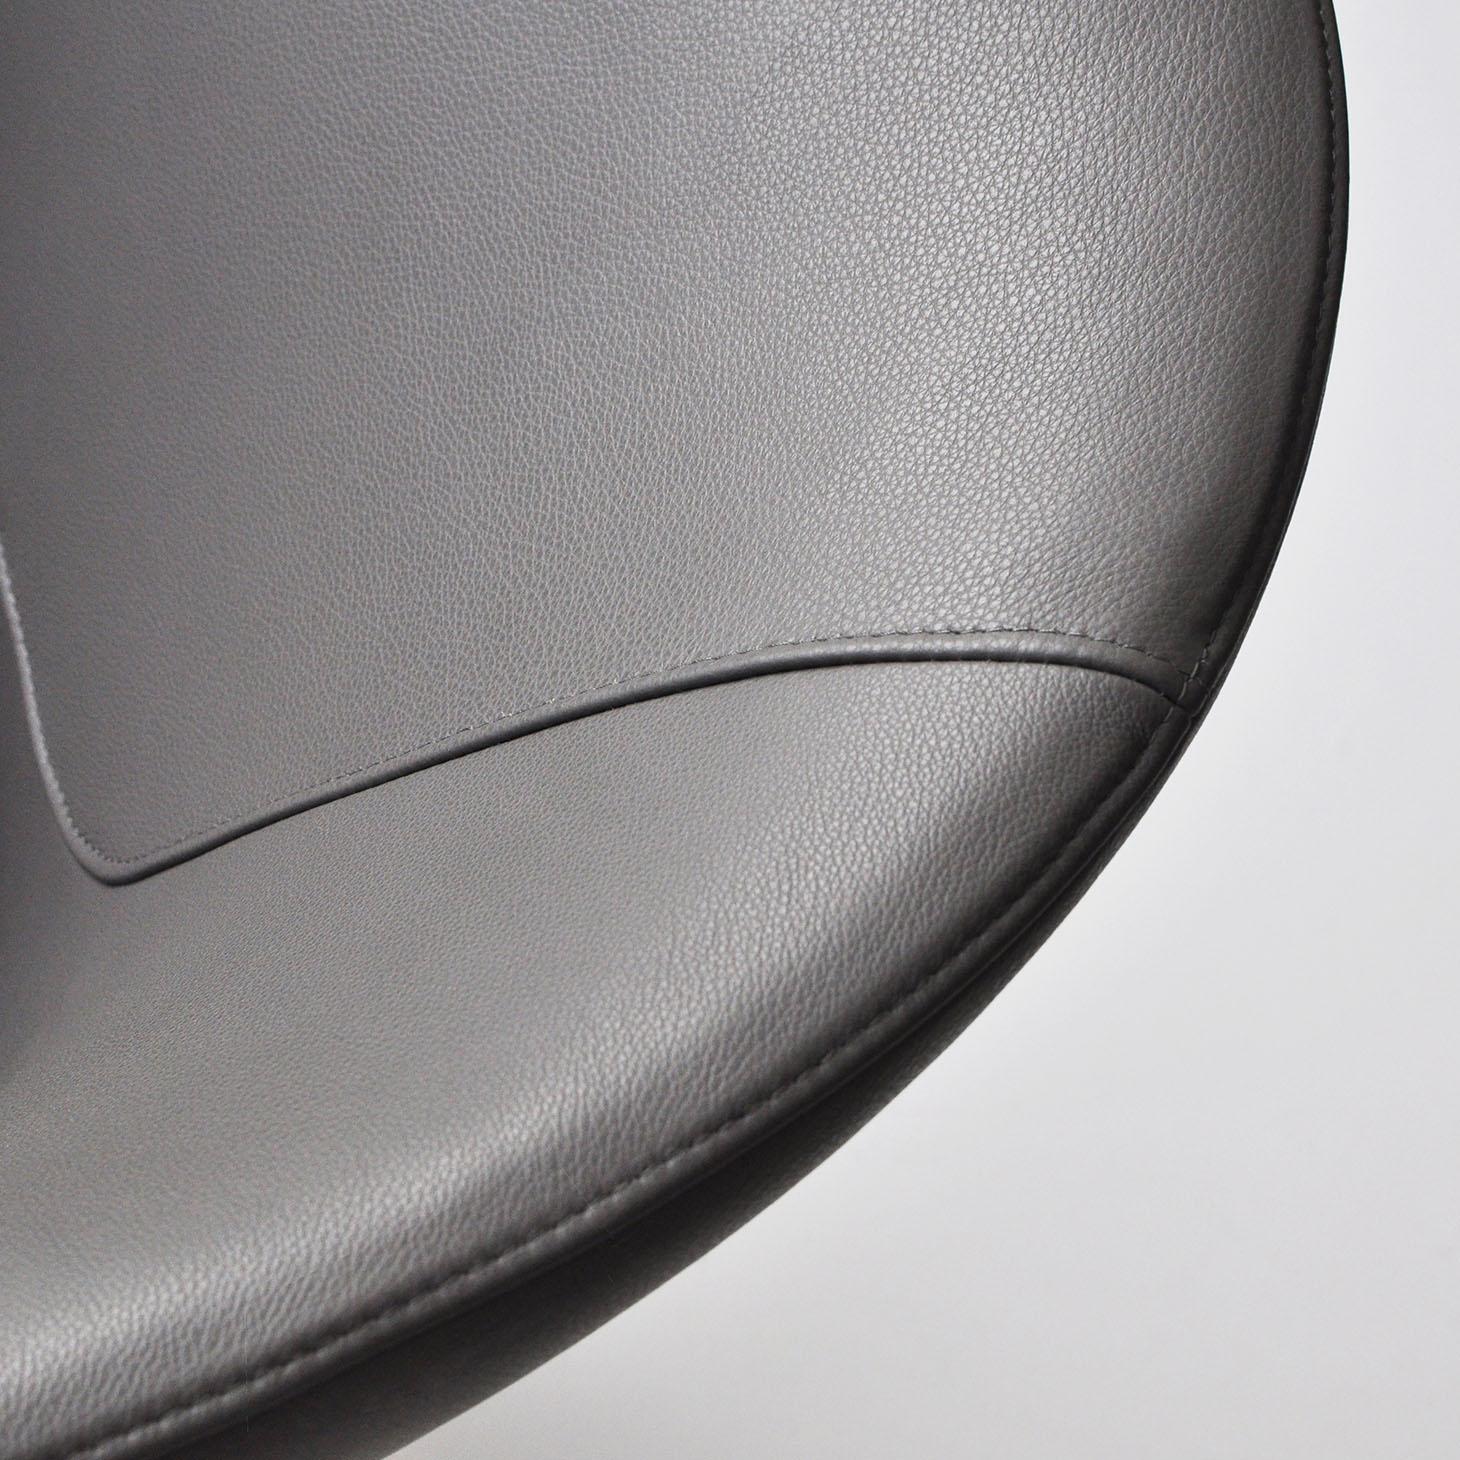 U Turn lounge chair detail